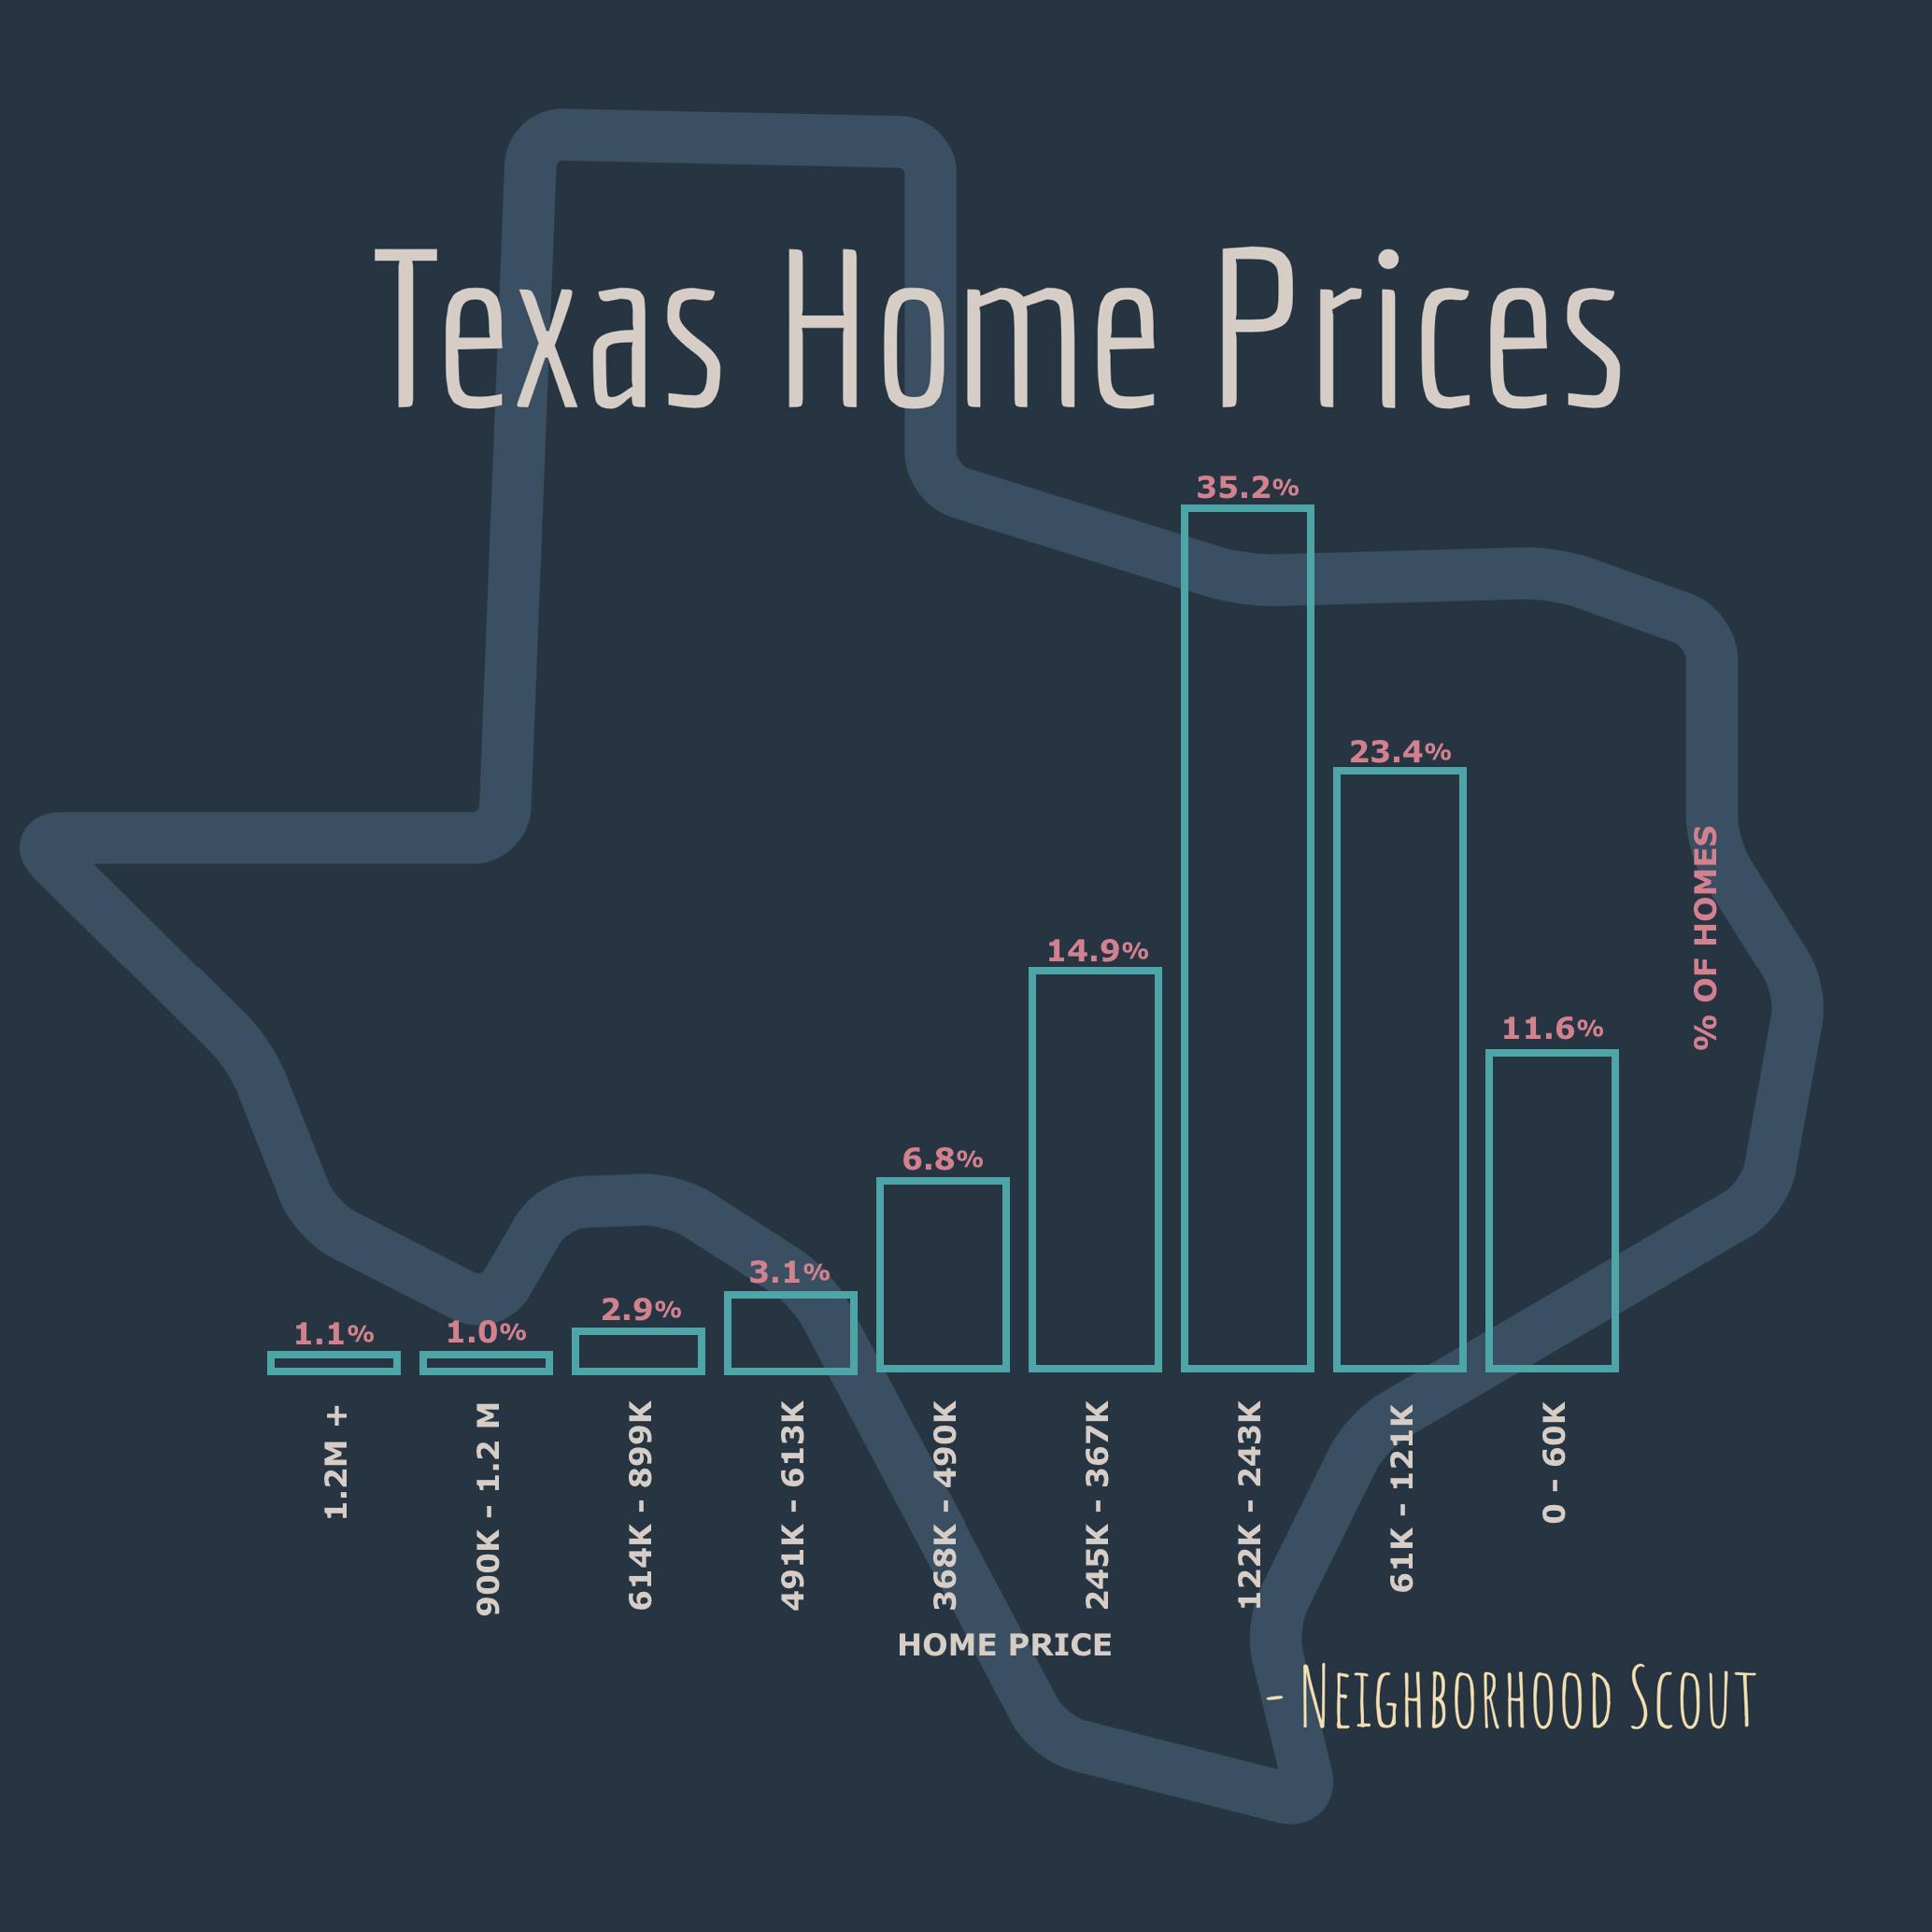 Texas Home Prices